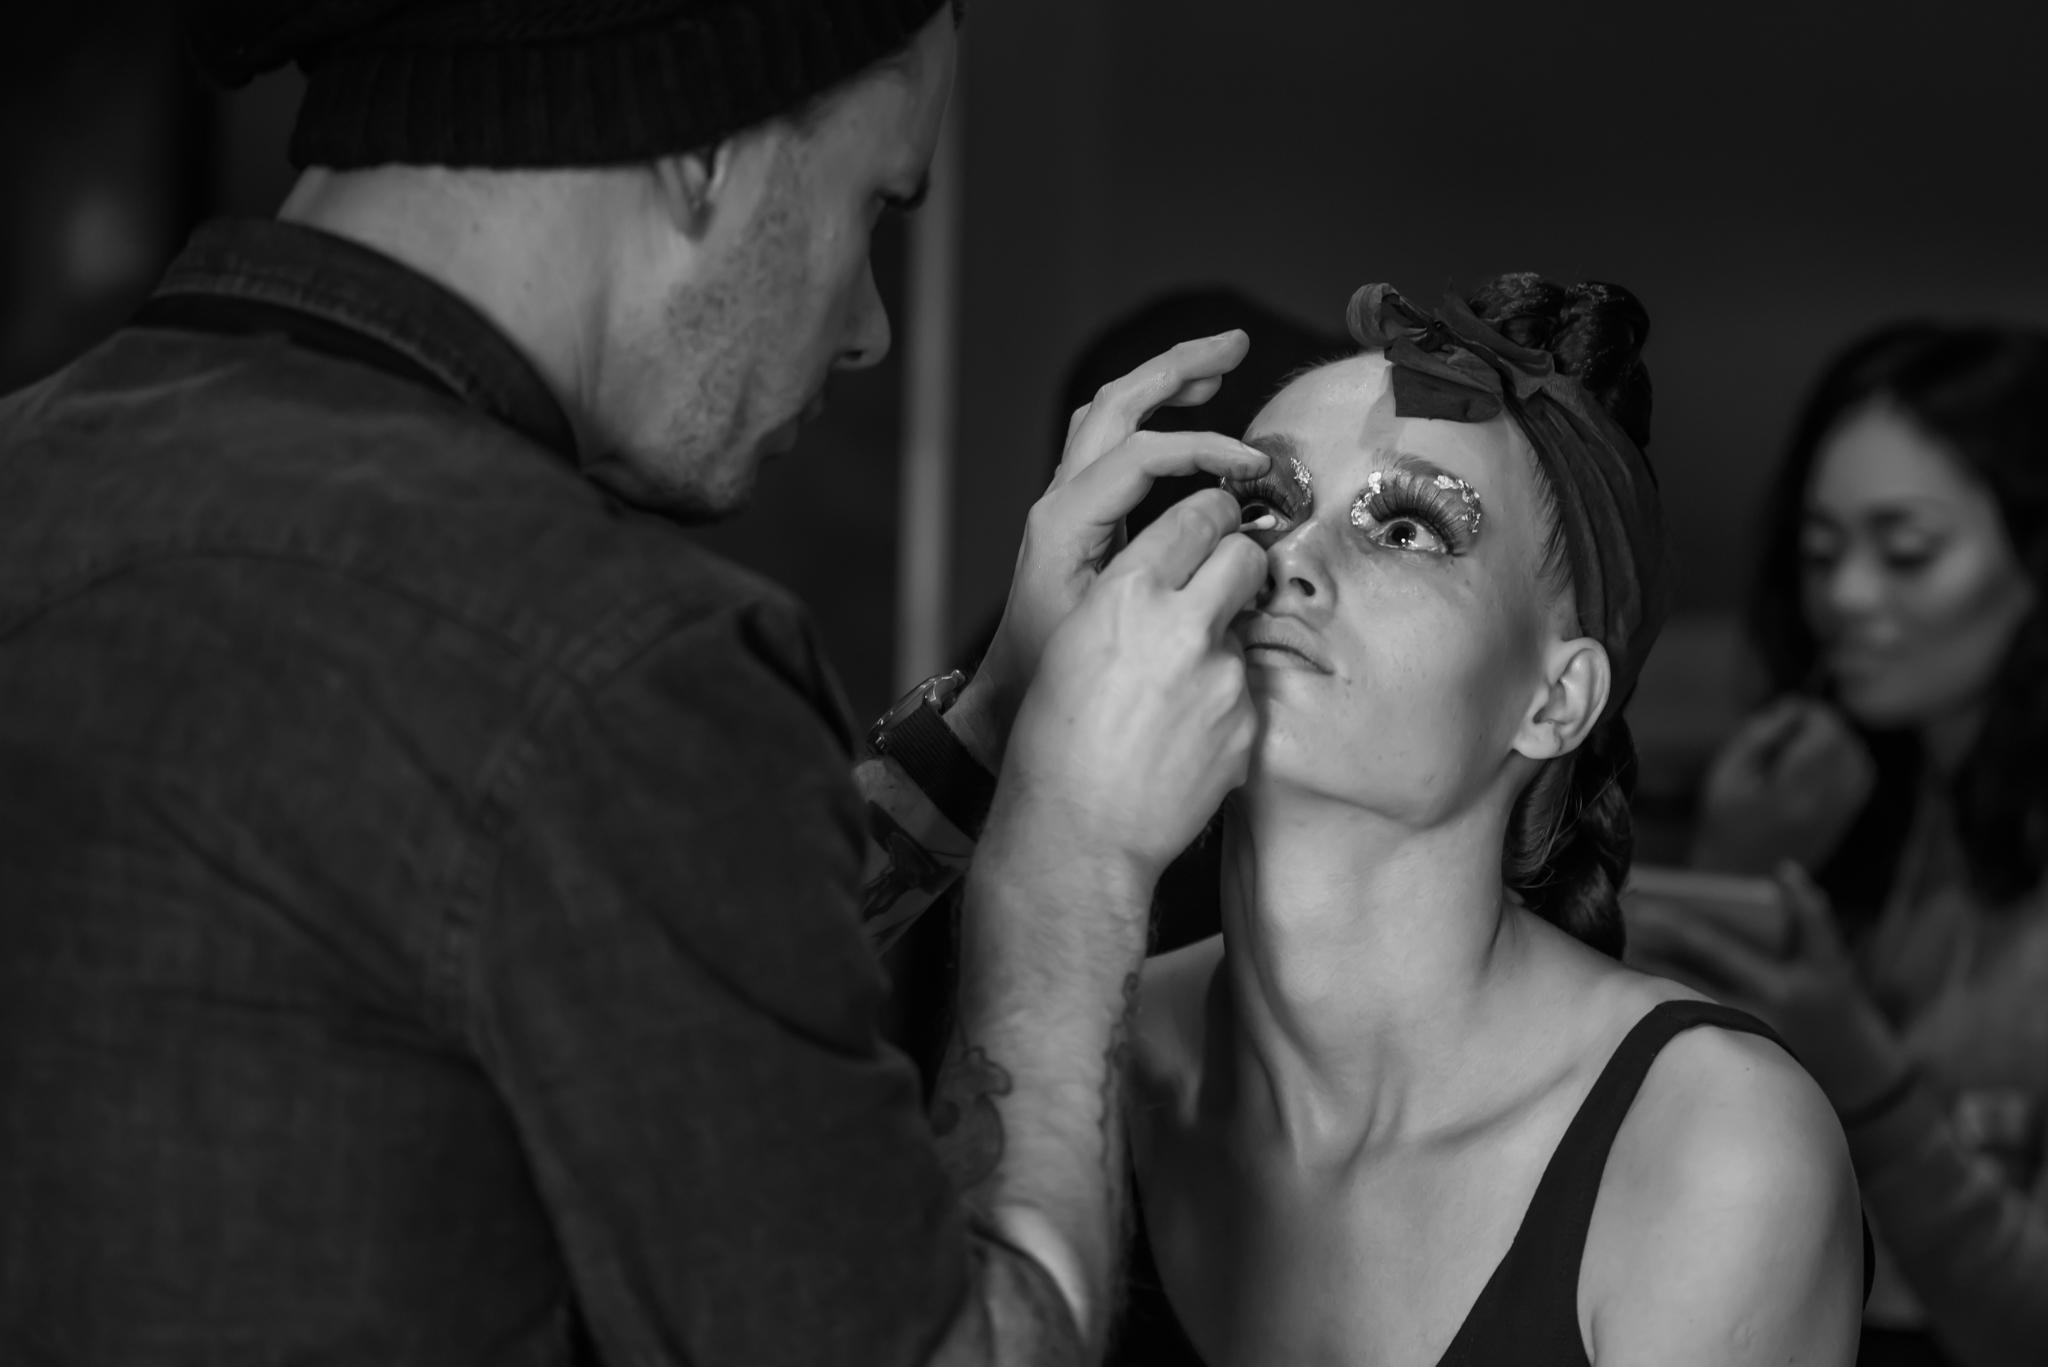 For designer Raina Trimble I got to apply gold flake to my good friend and model Katya Estes.